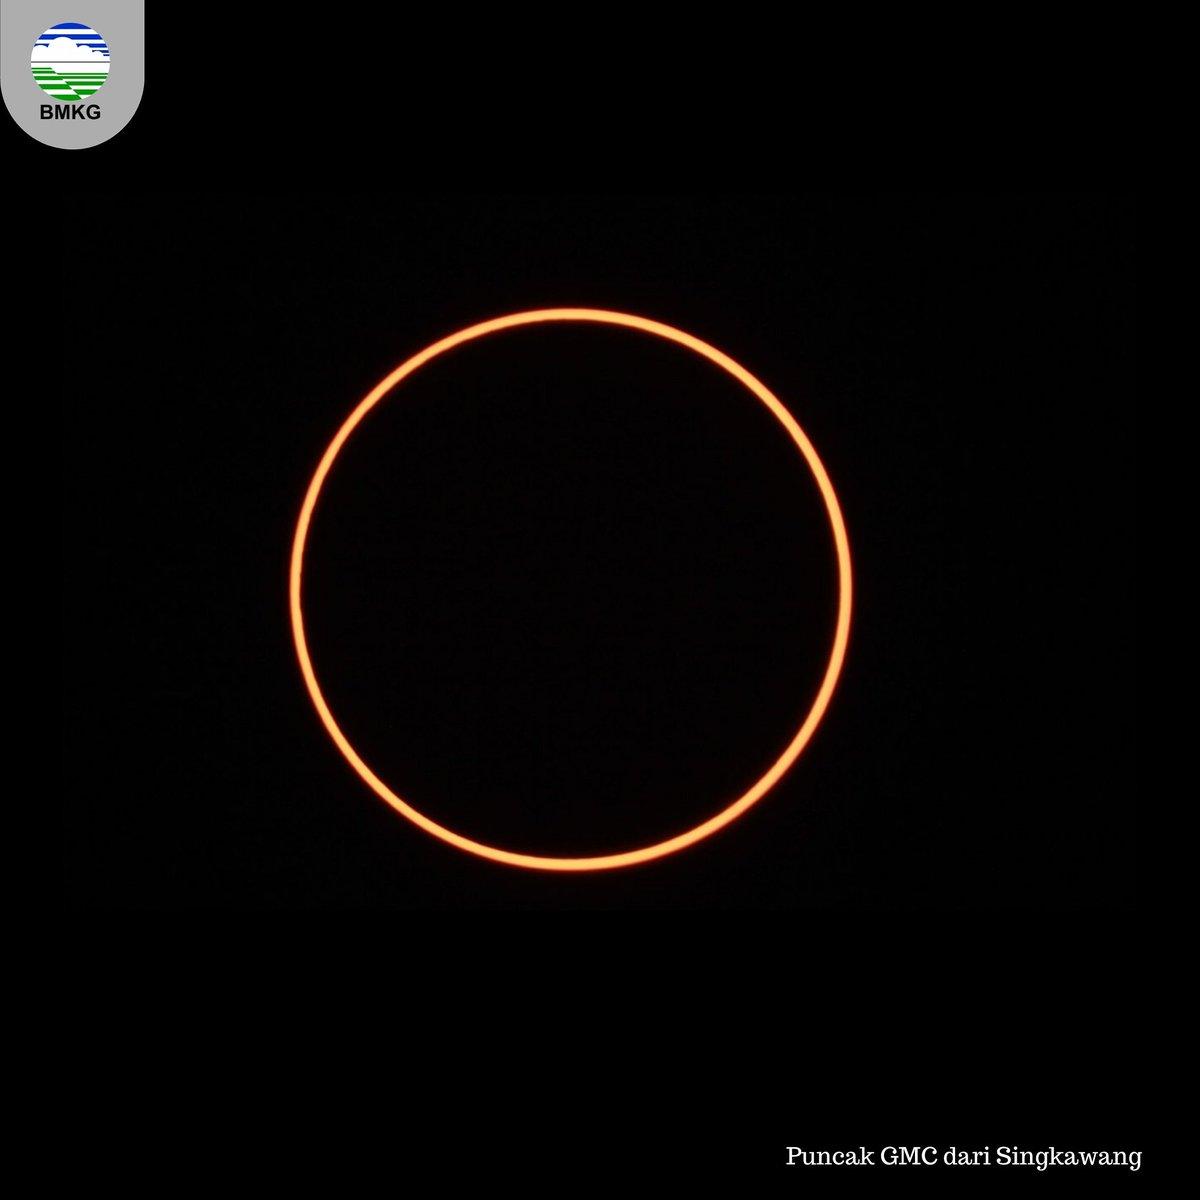 Dan inilah penampakan Gerhana Matahari Cincin Sempurna yang berhasil diabadikan Tim BMKG yang melakukan observasi di Singkawang  Sungguh indah dan menakjubkan #BMKG #GerhanaMatahariCincin https://t.co/cW8y5q1GY8